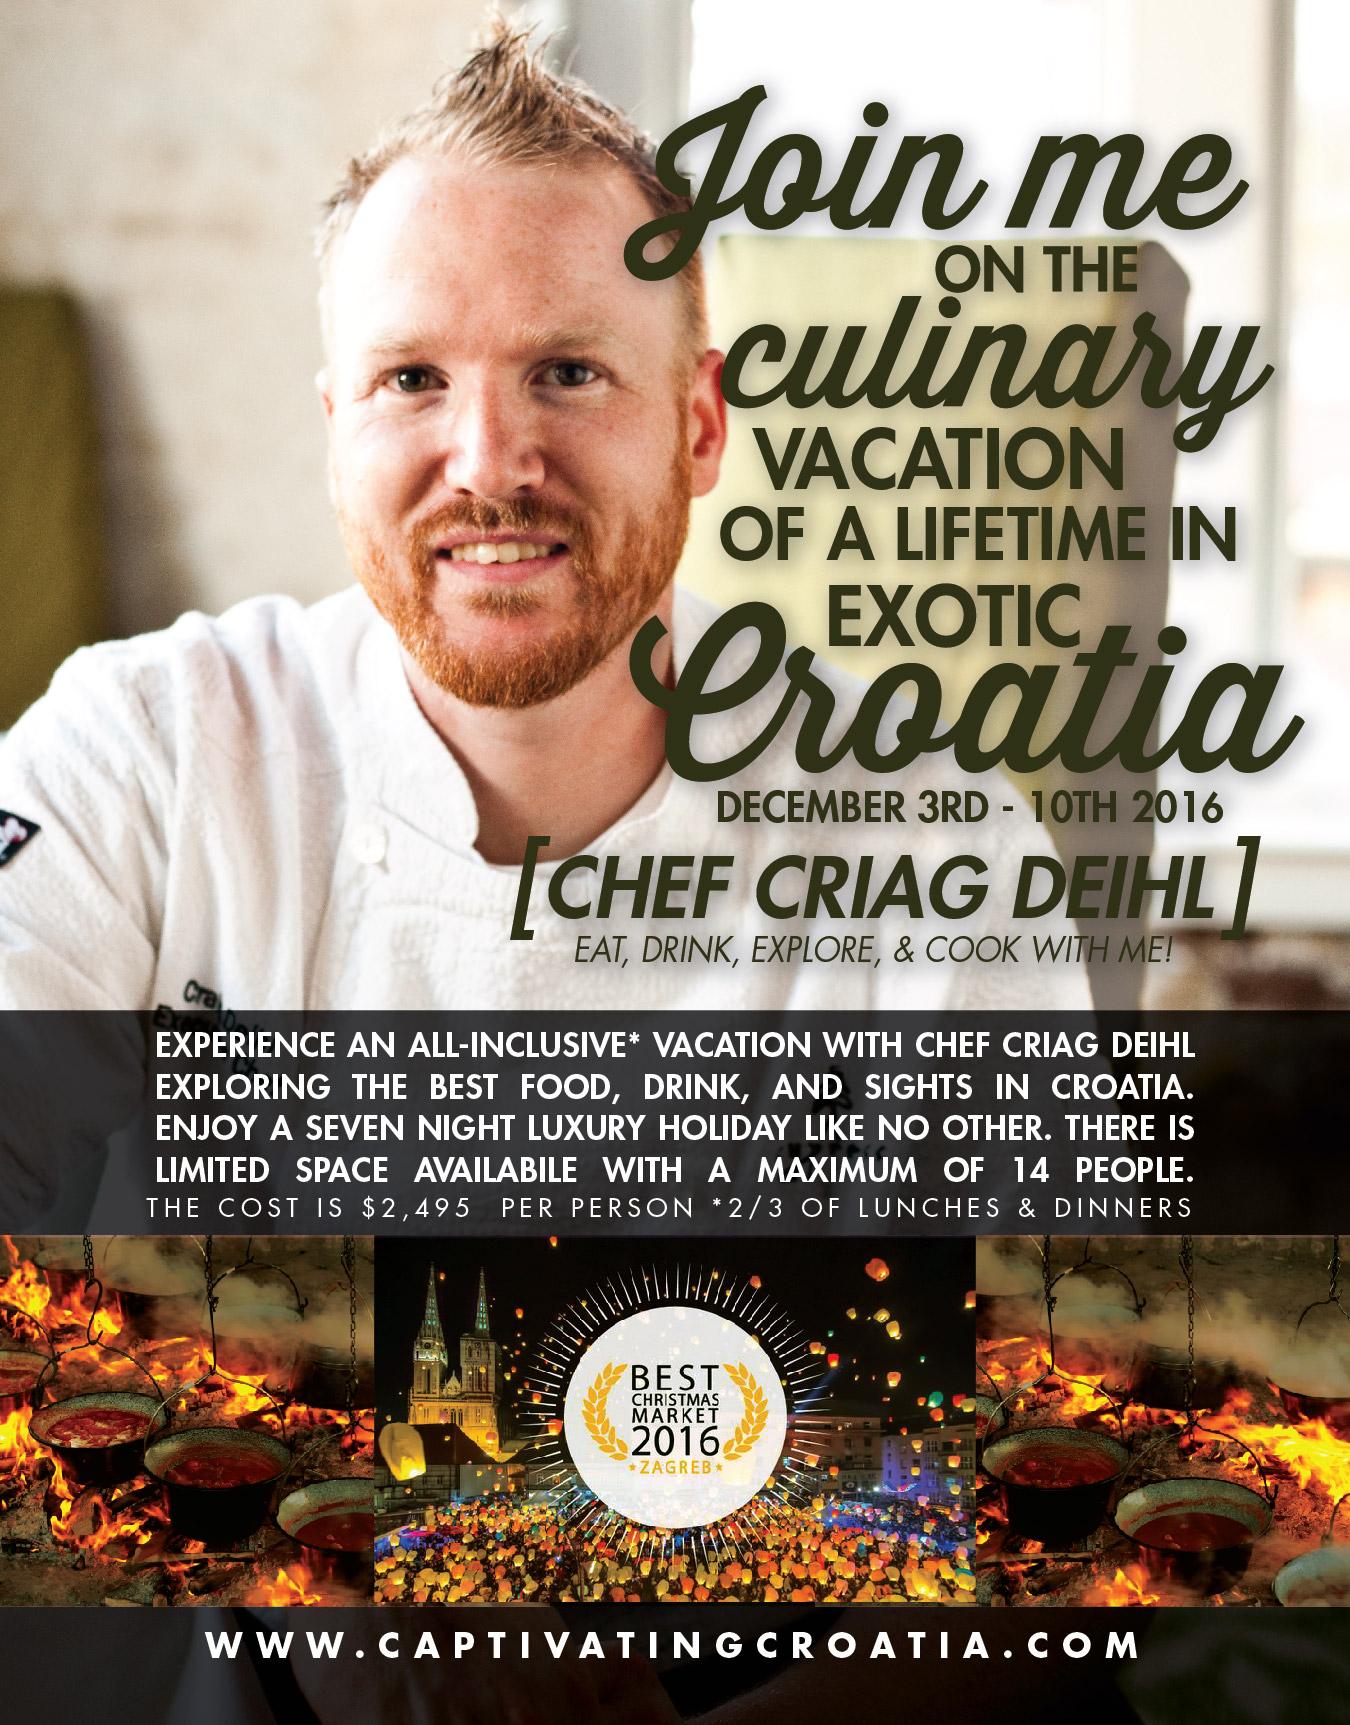 Chef Craig